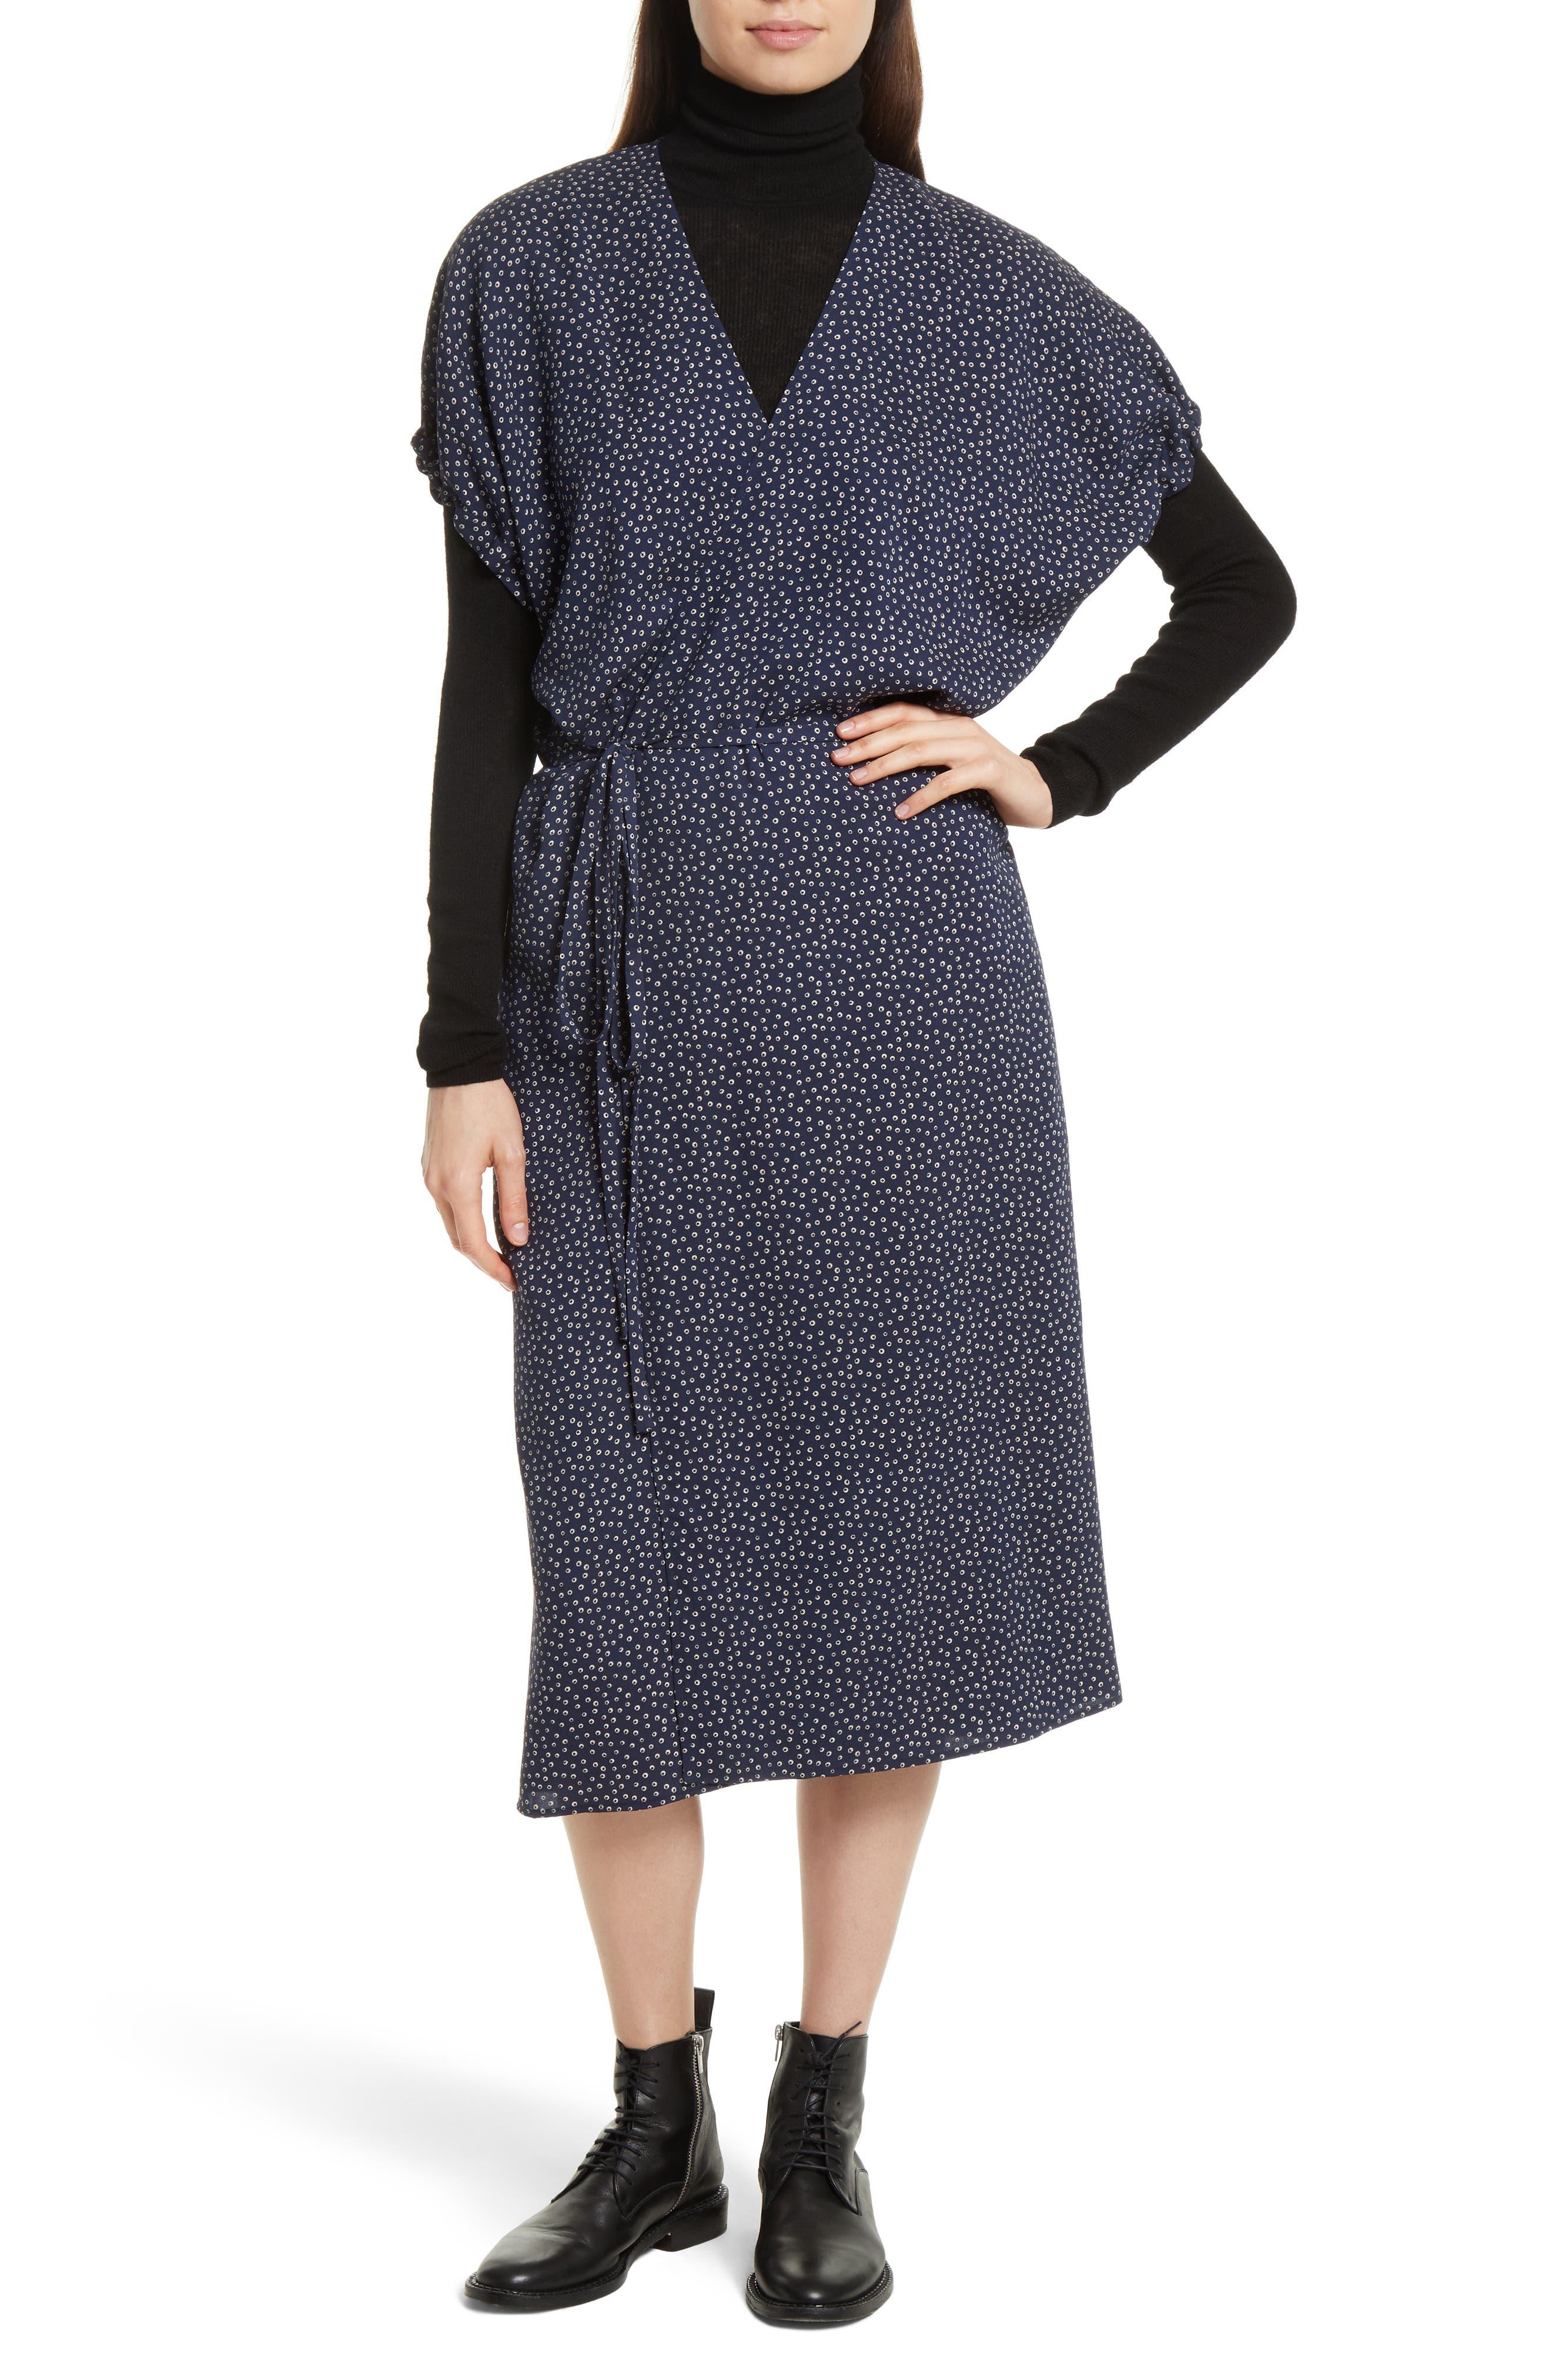 Alternate Image 1 Selected - Vince Celestial Polka Dot Kimono Wrap Dress